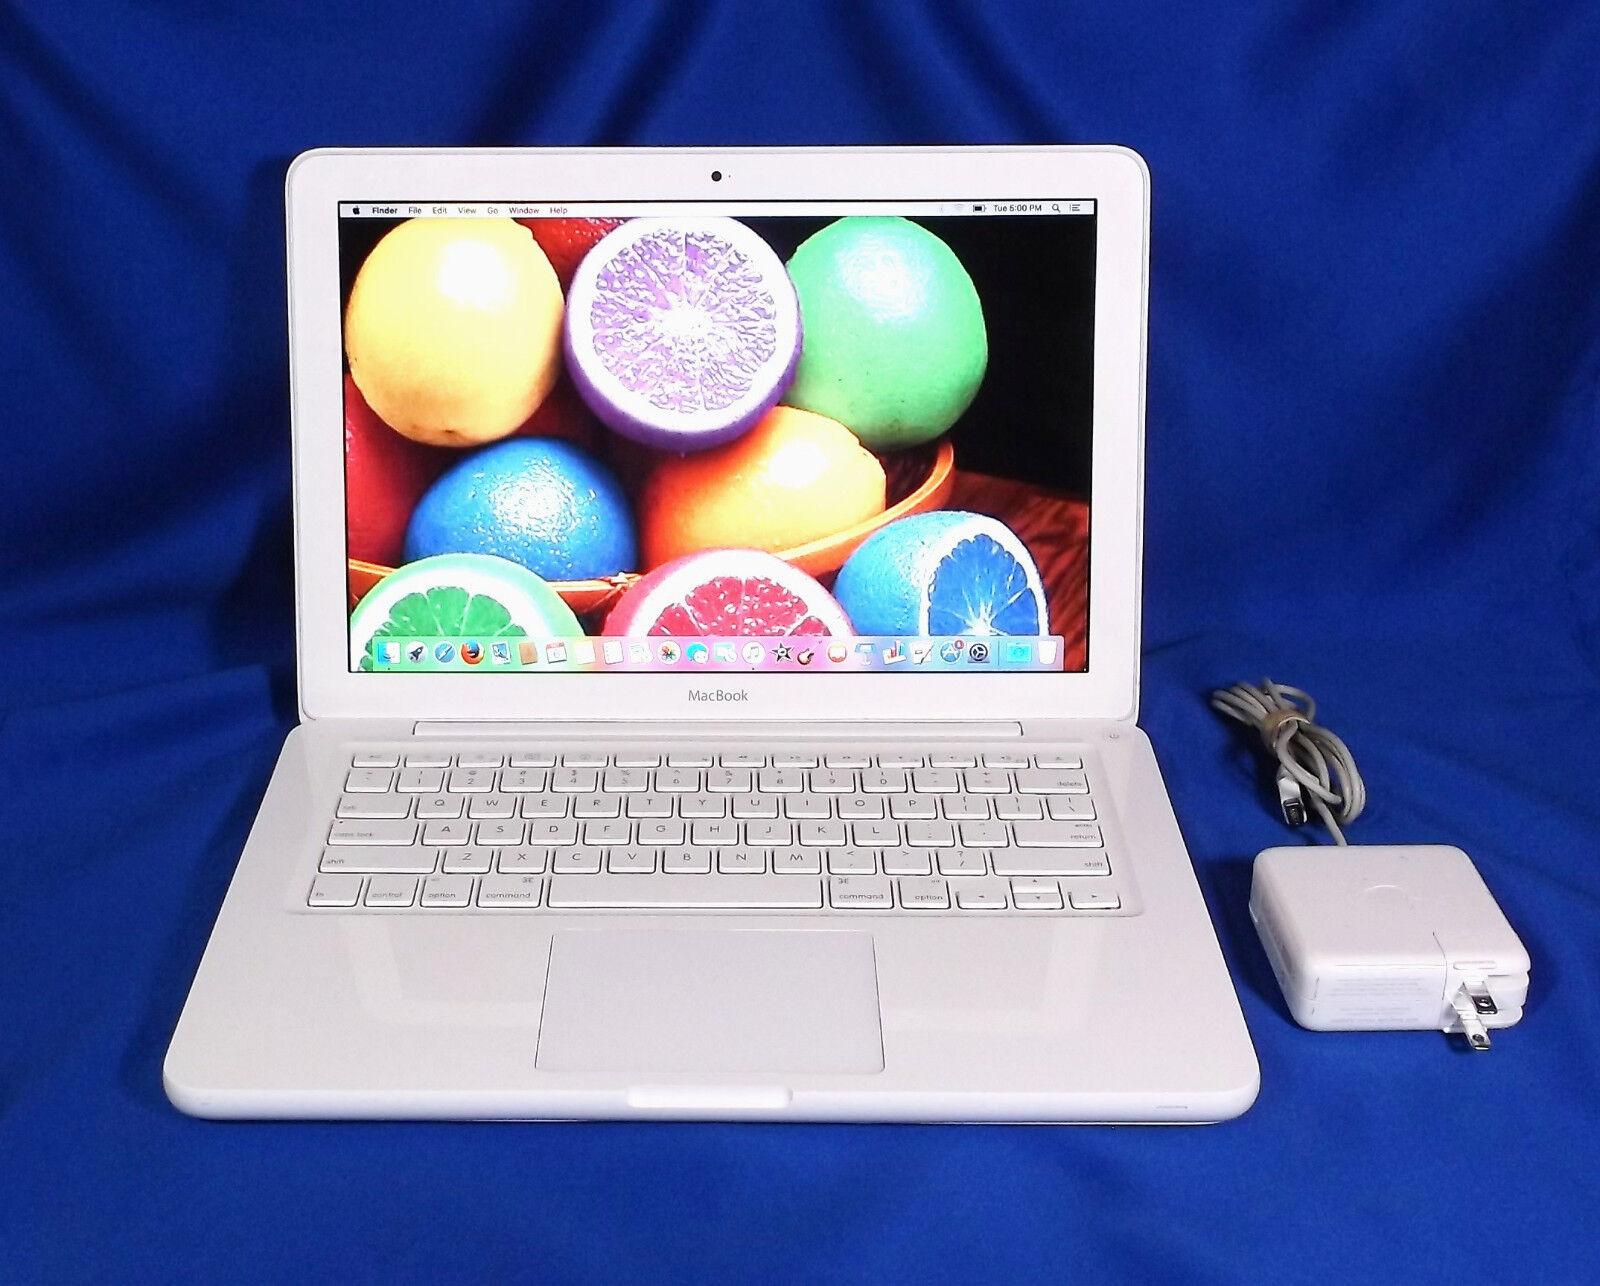 "Macbook - Apple Macbook 13"" Unibody A1342 (Sierra 10.12) CHOOSE your HARD DRIVE & MEMORY !"